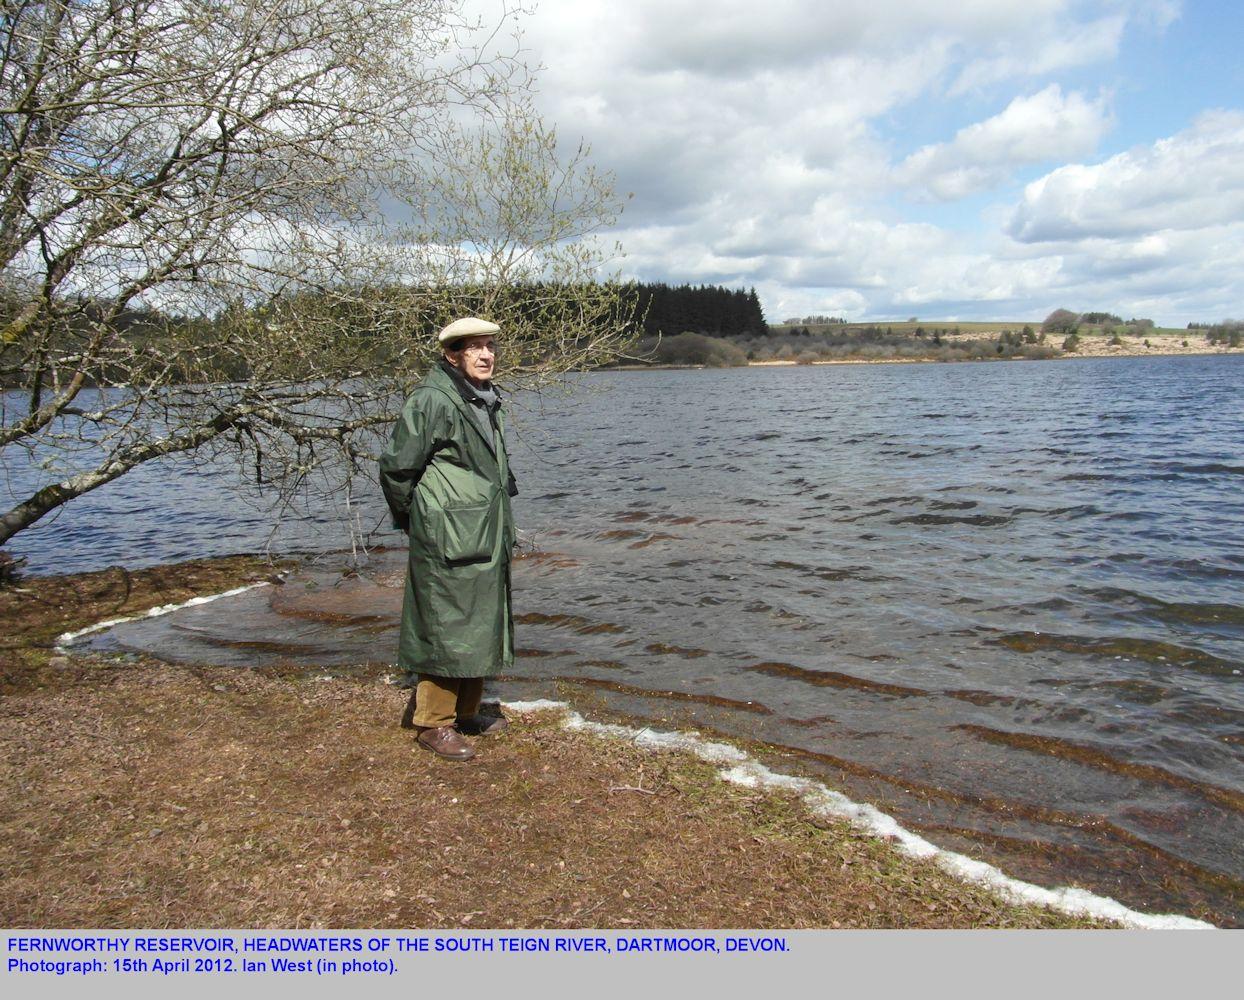 Ian West at Fernworthy Reservoir on Dartmoor Granite, southwest of Chagford, Dartmoor, Devon, 15th April 2012